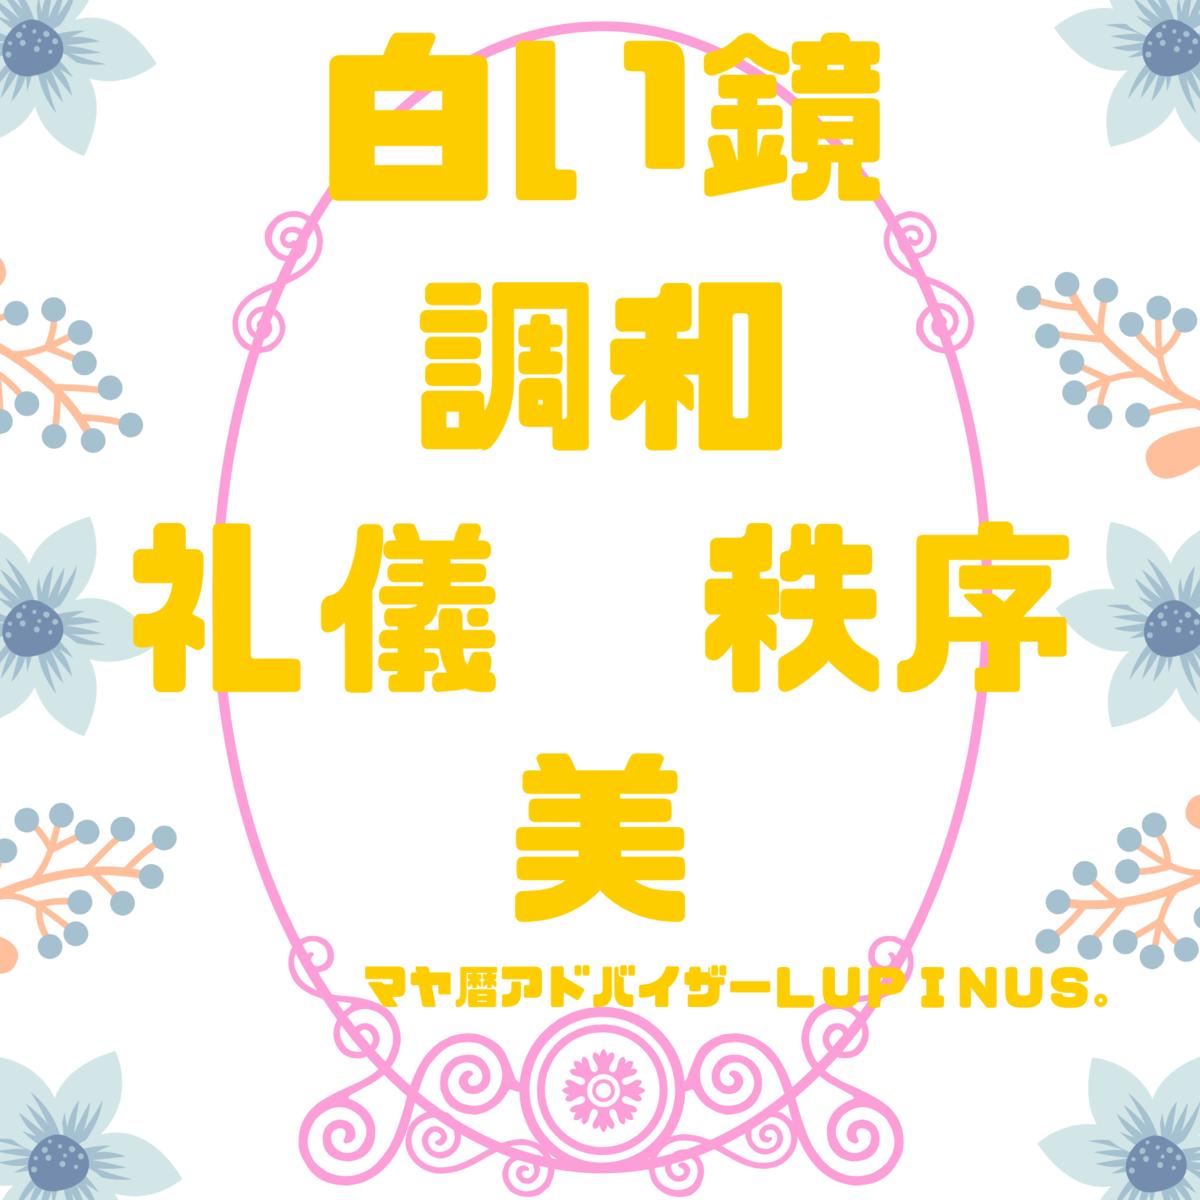 f:id:Lupinus104:20210409100018p:plain